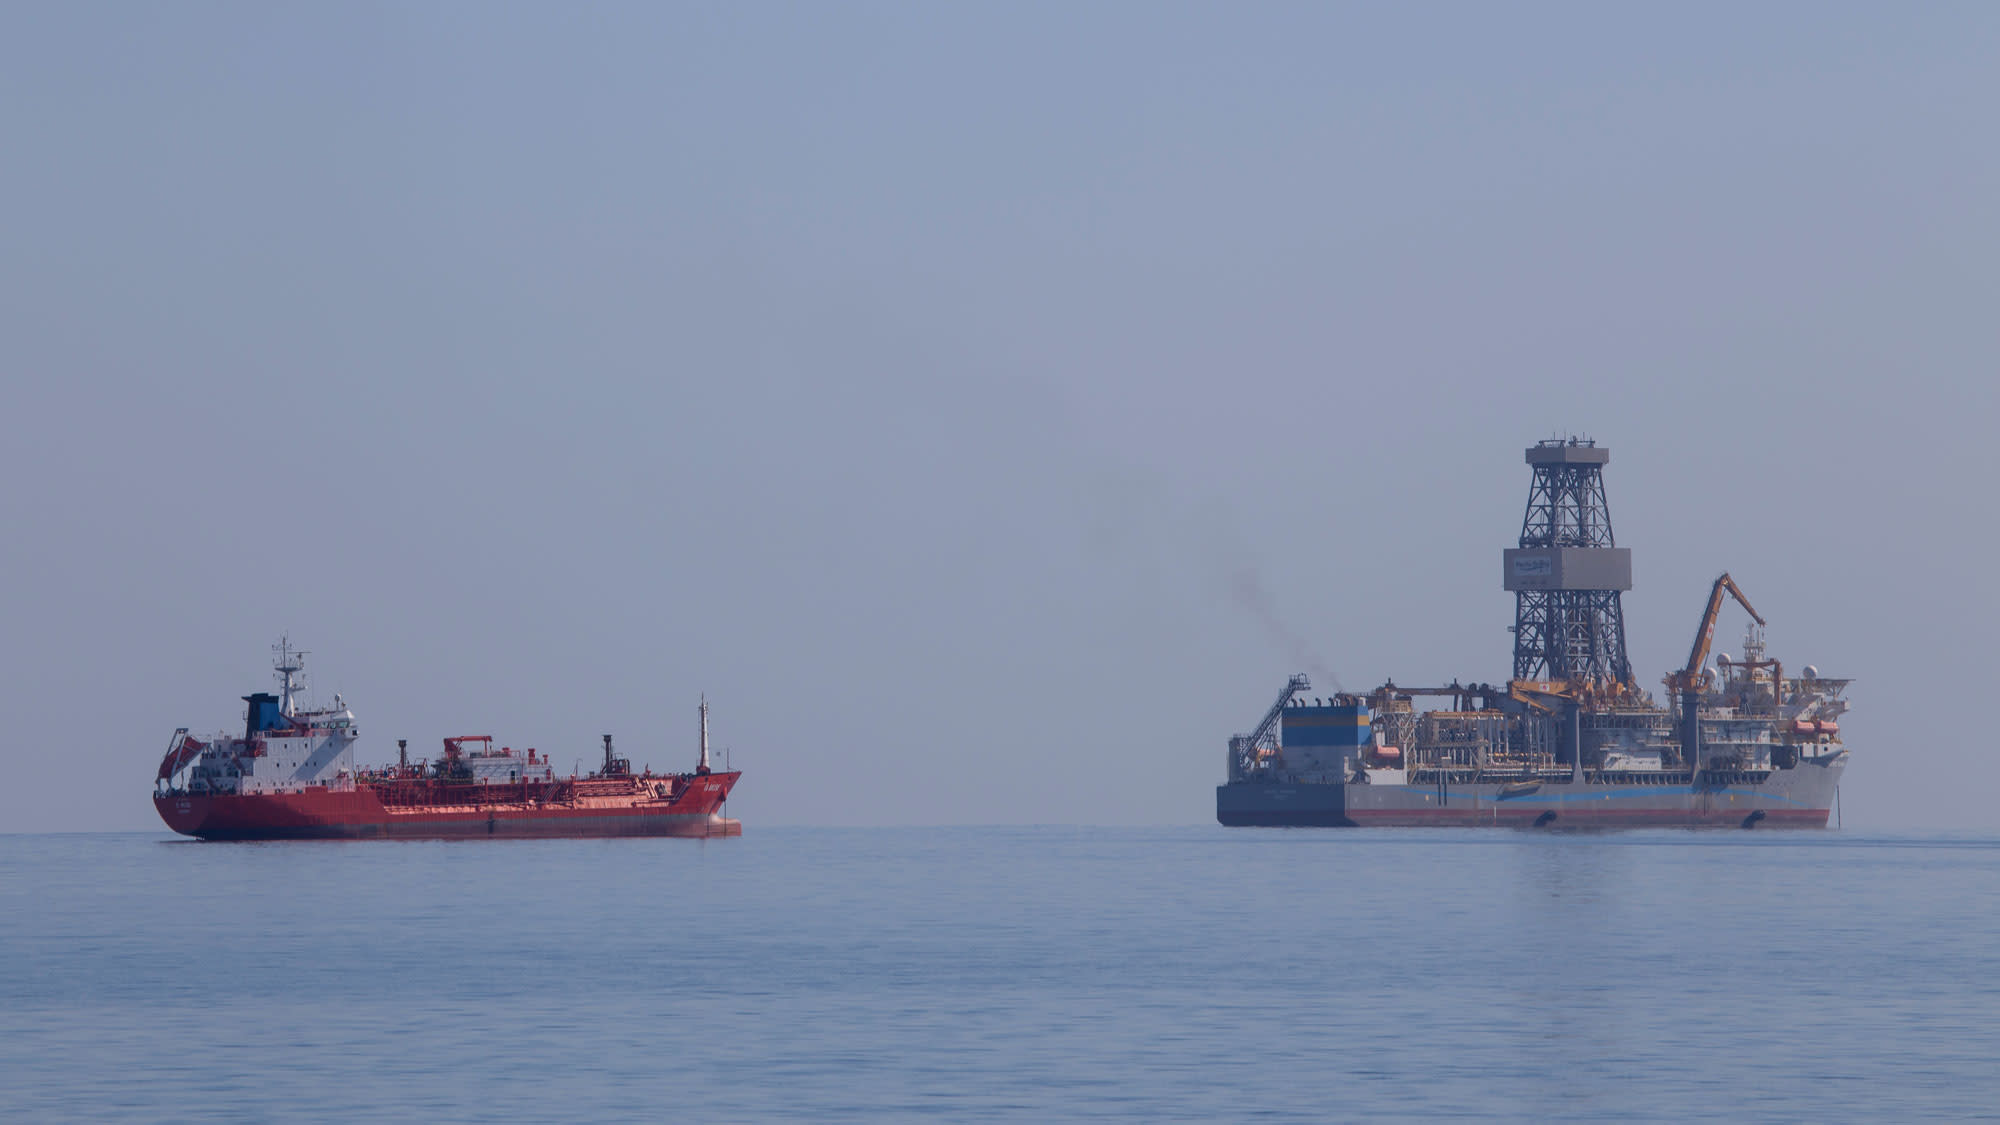 Premium: Pacific Khamsin off-shore gas Cyprus 161104